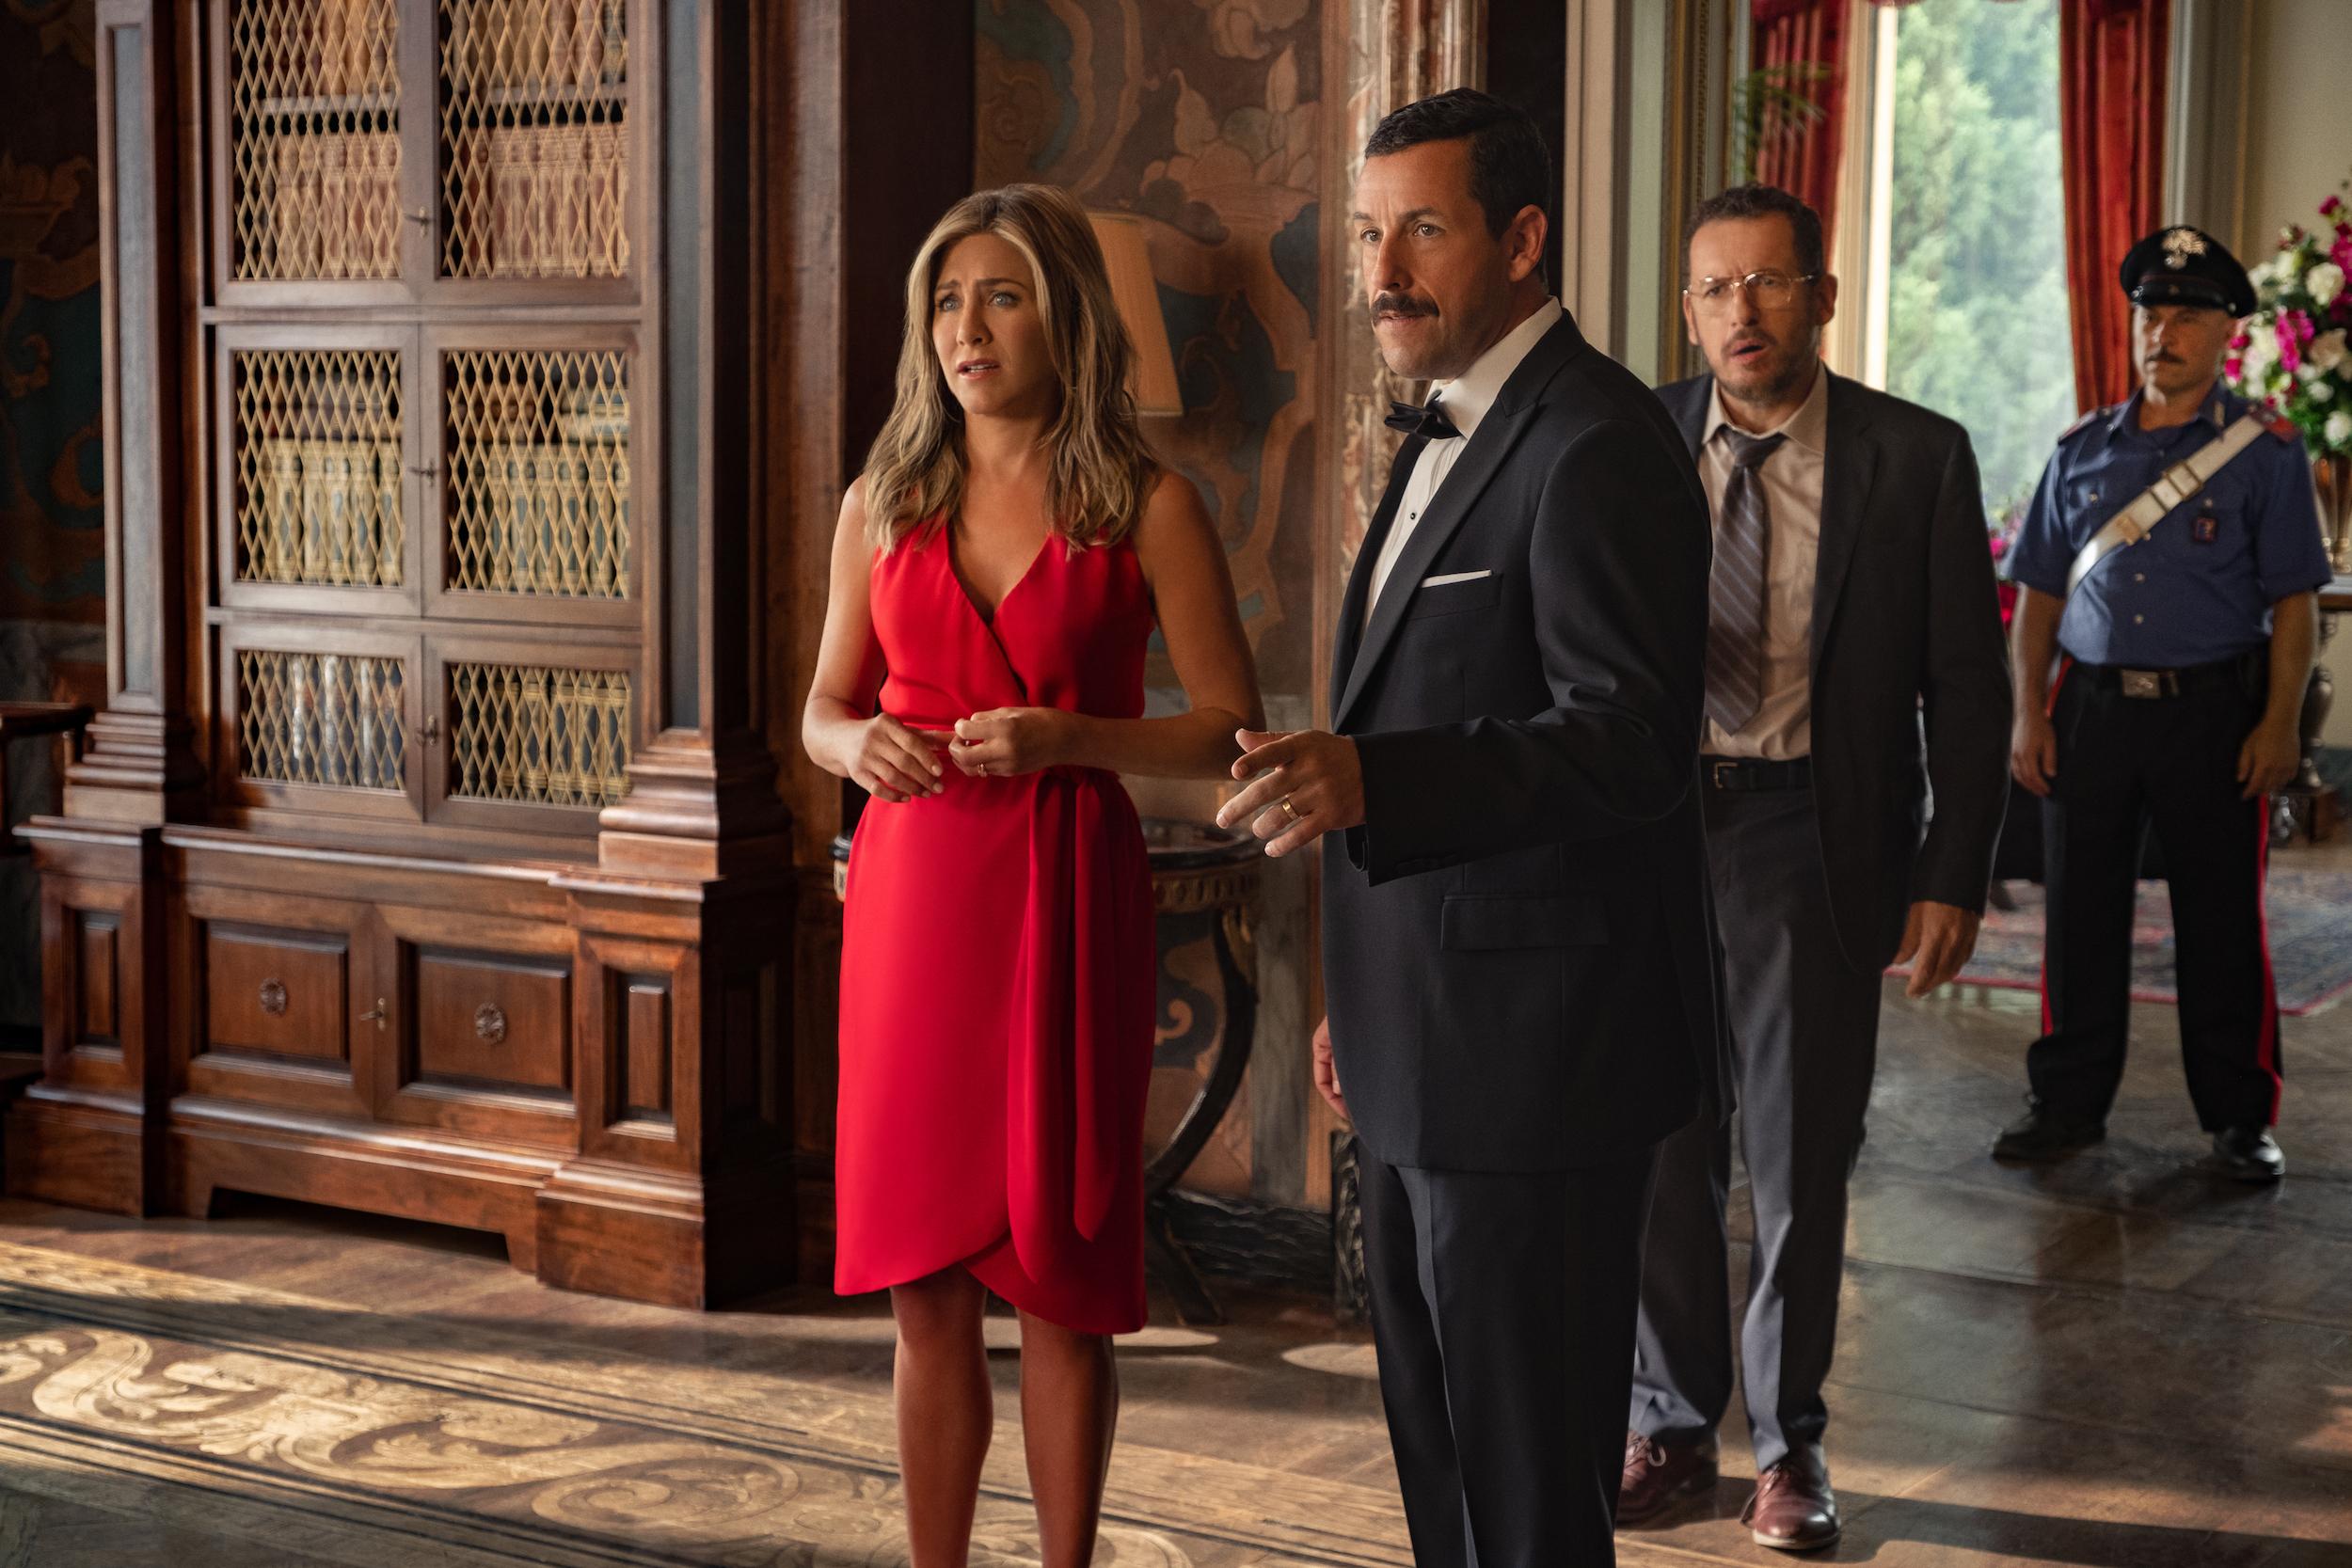 Netflix's new Adam Sandler movie Murder Mystery is unexpectedly meta